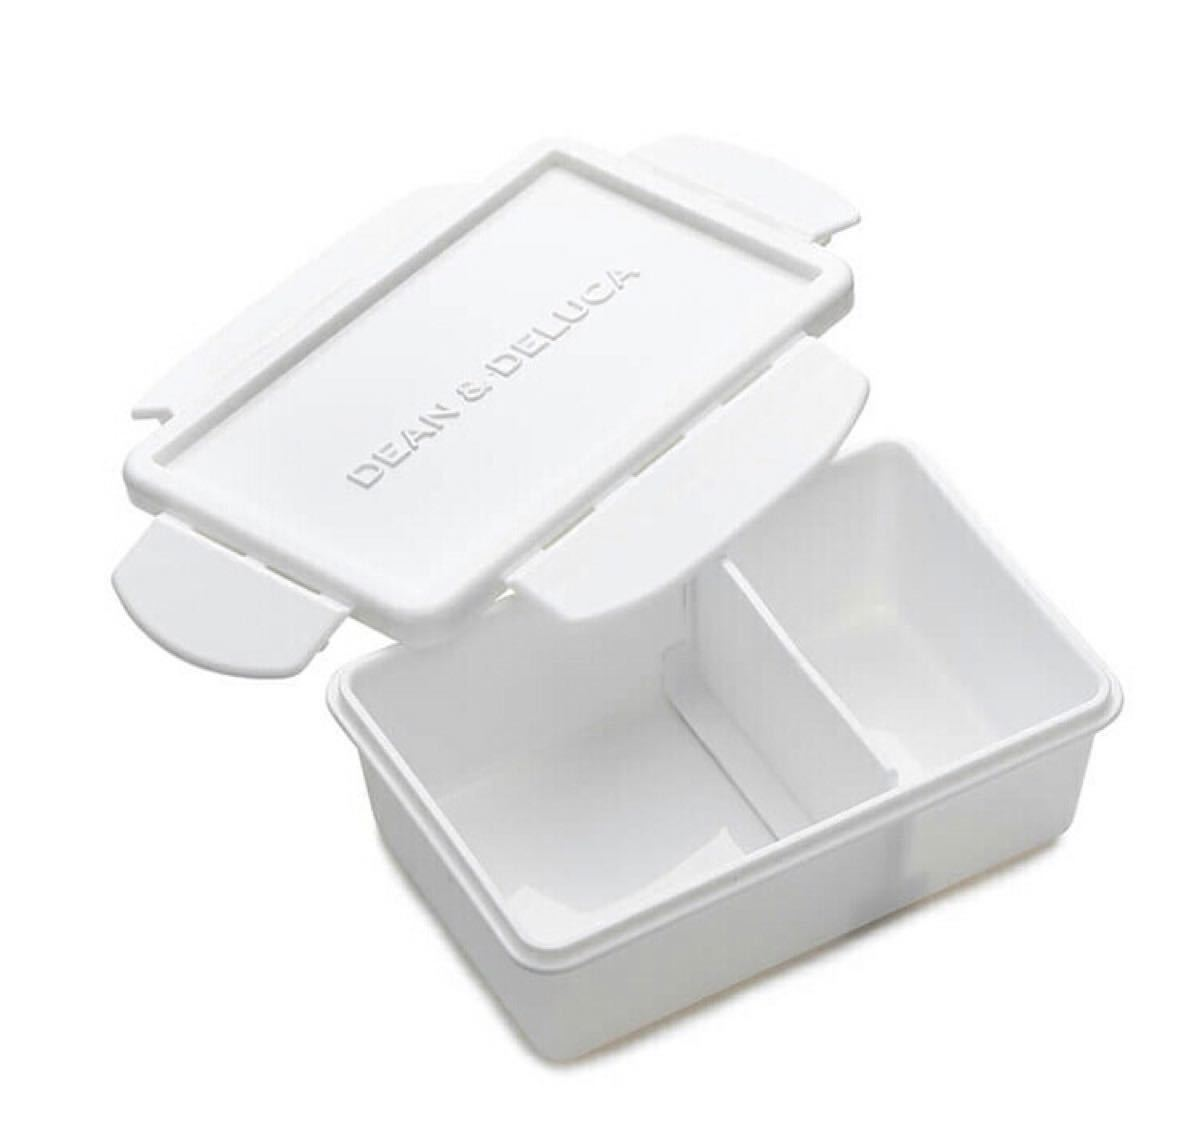 DEAN&DELUCA ディーンアンドデルーカ お弁当箱 ランチボックス